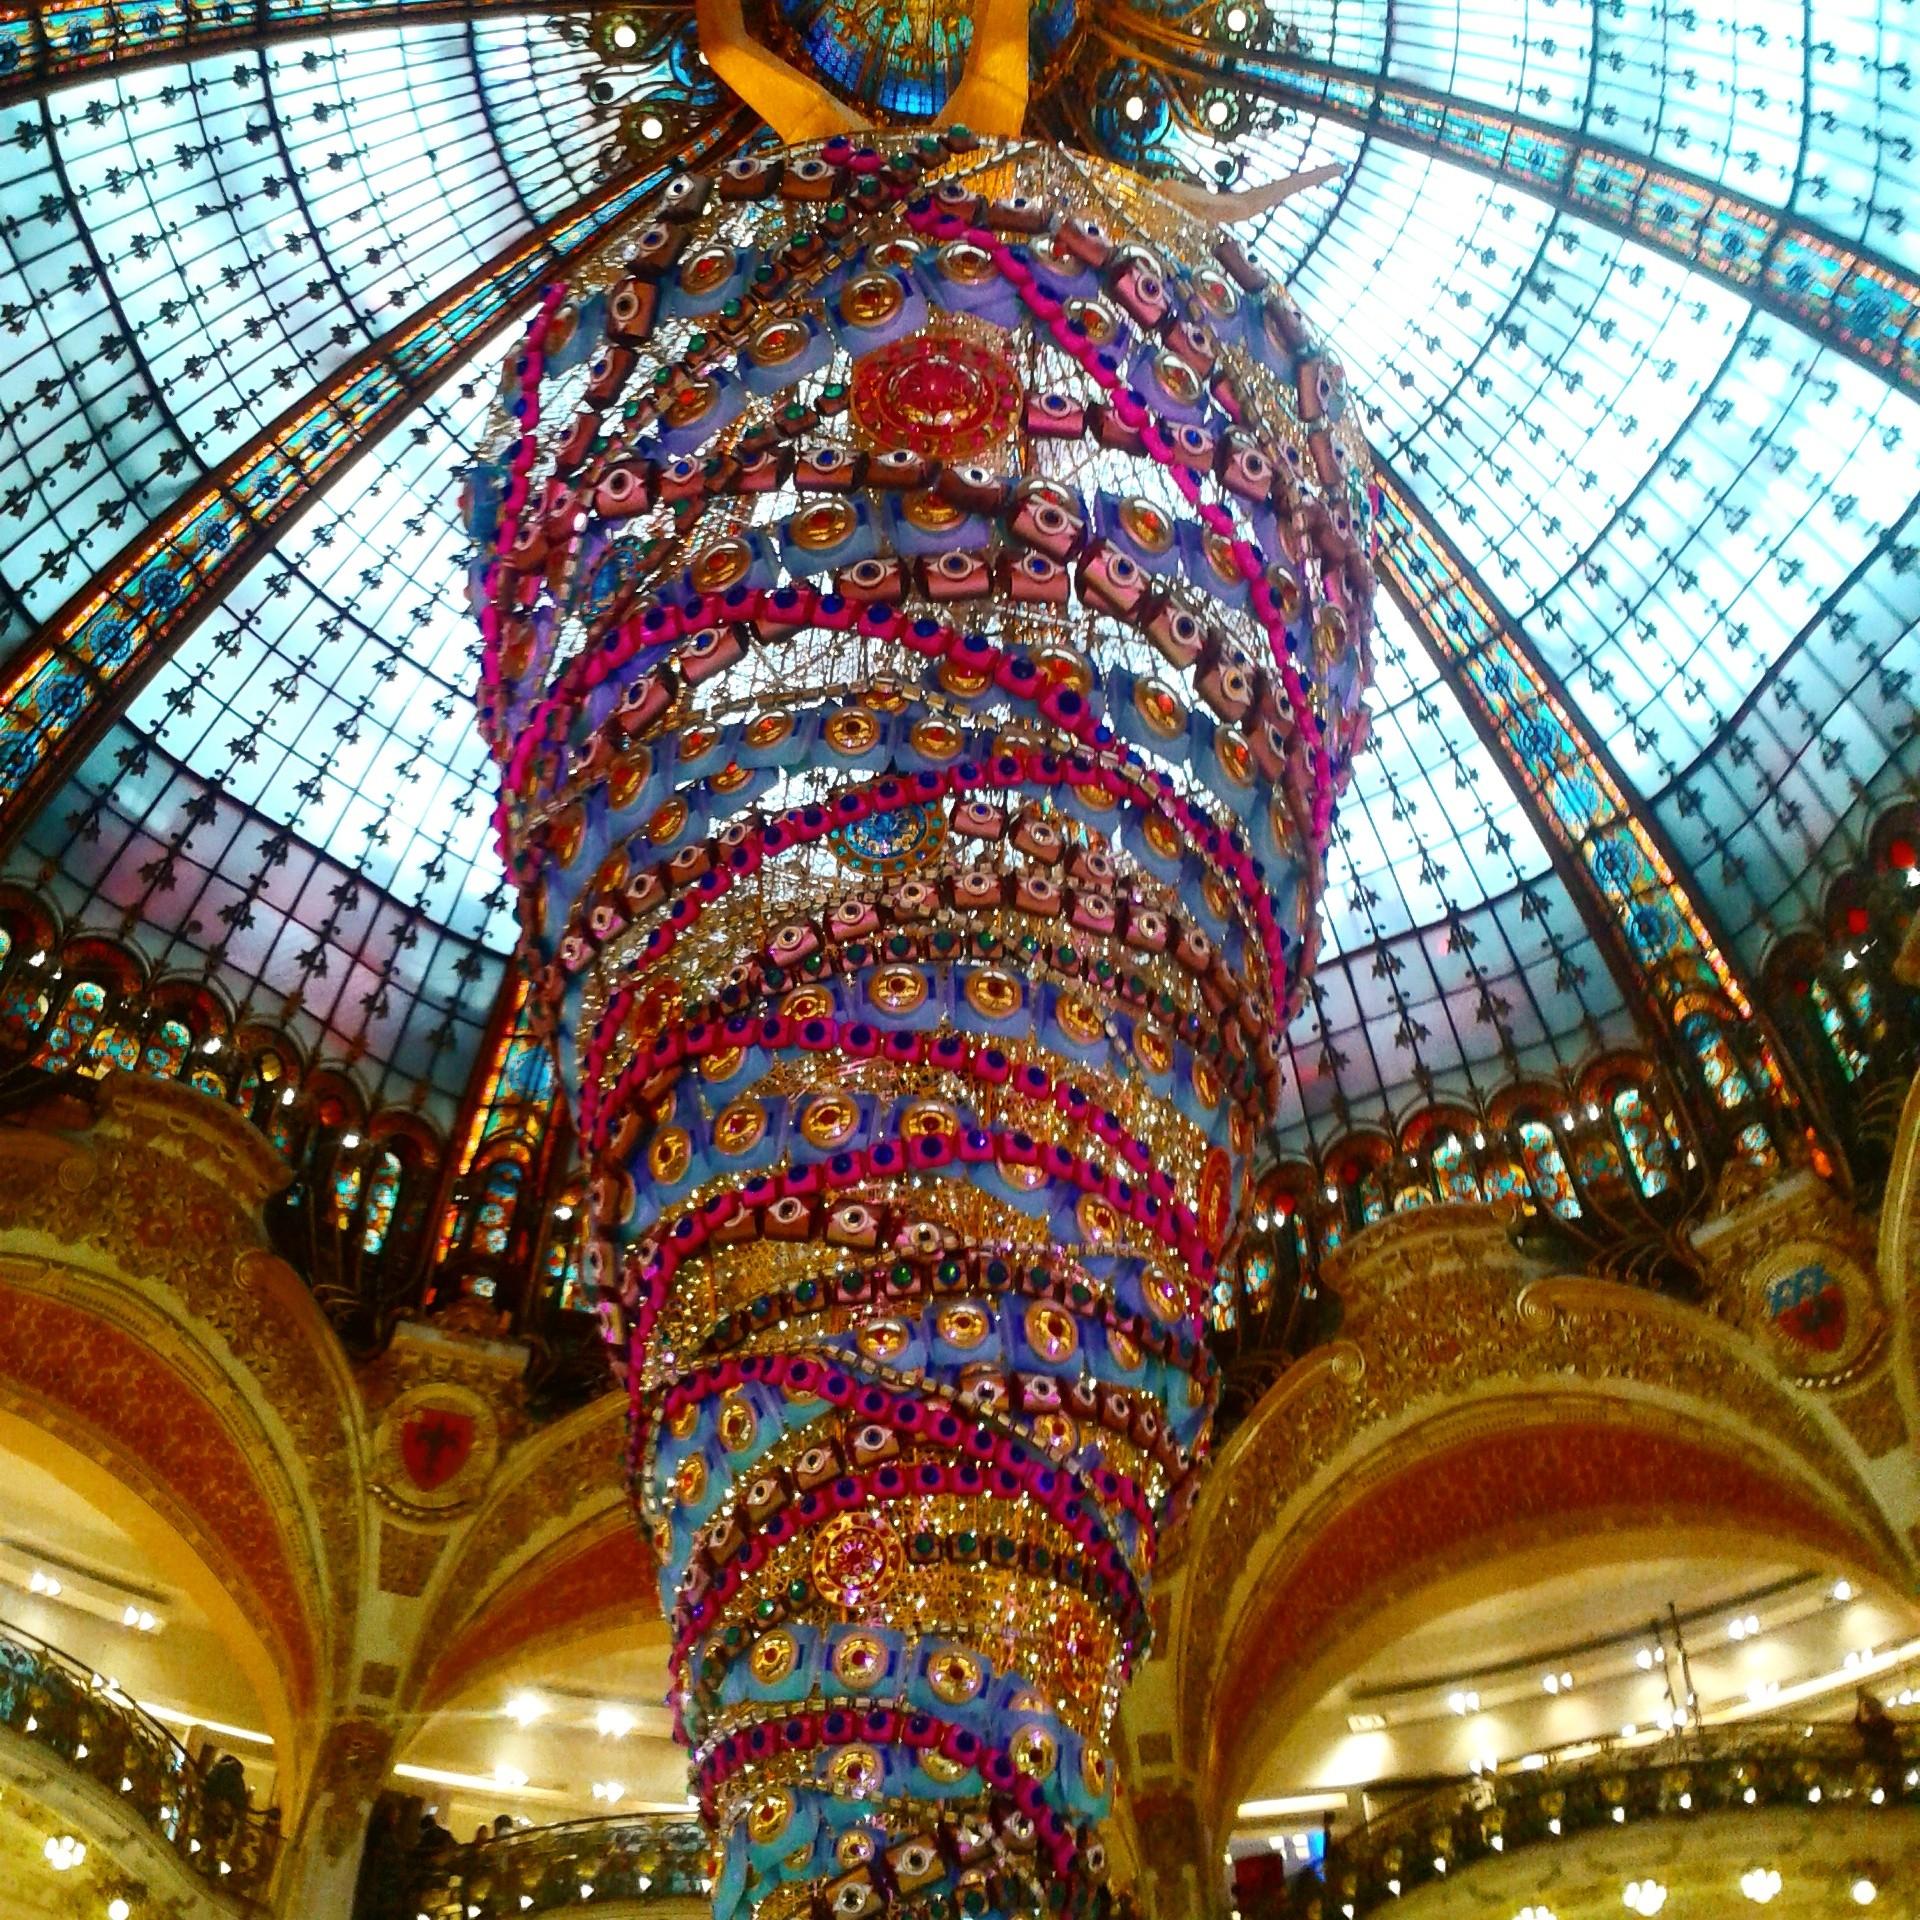 Upside down Christmas Tree, Galeries Lafayette, Paris | Todd's Travels Travel Blog